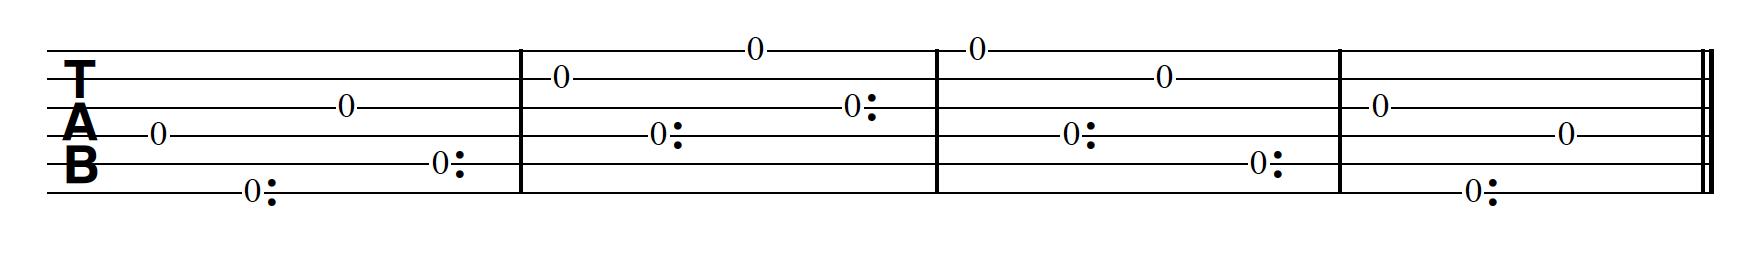 Harp Harmonic Pattern Regular Note First